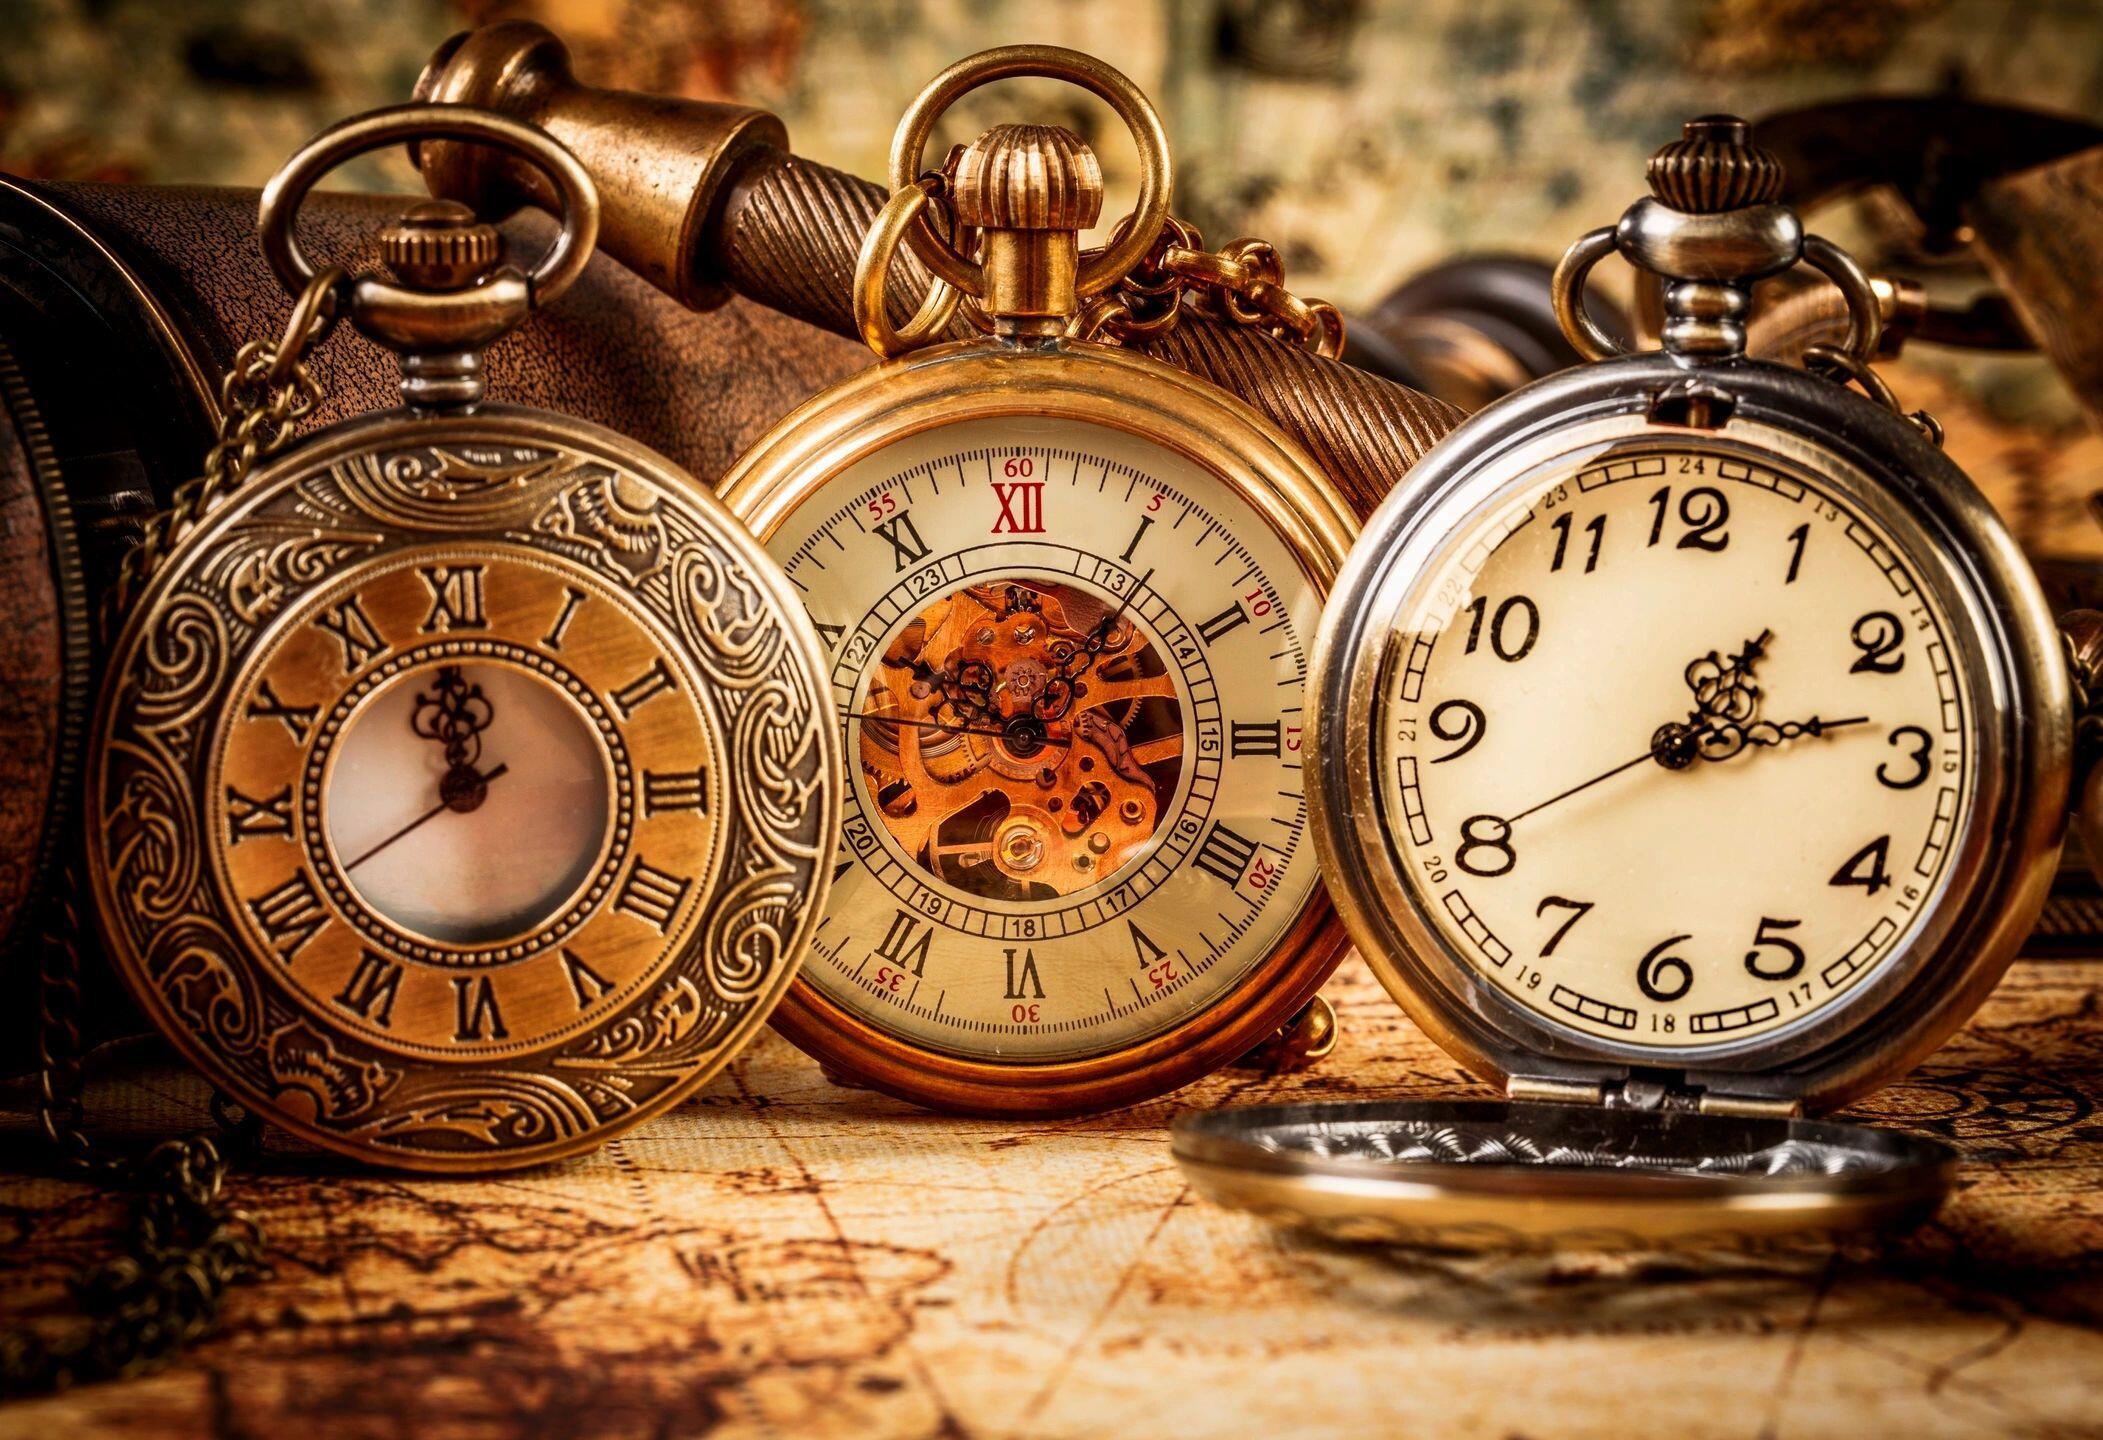 Antique-Watches